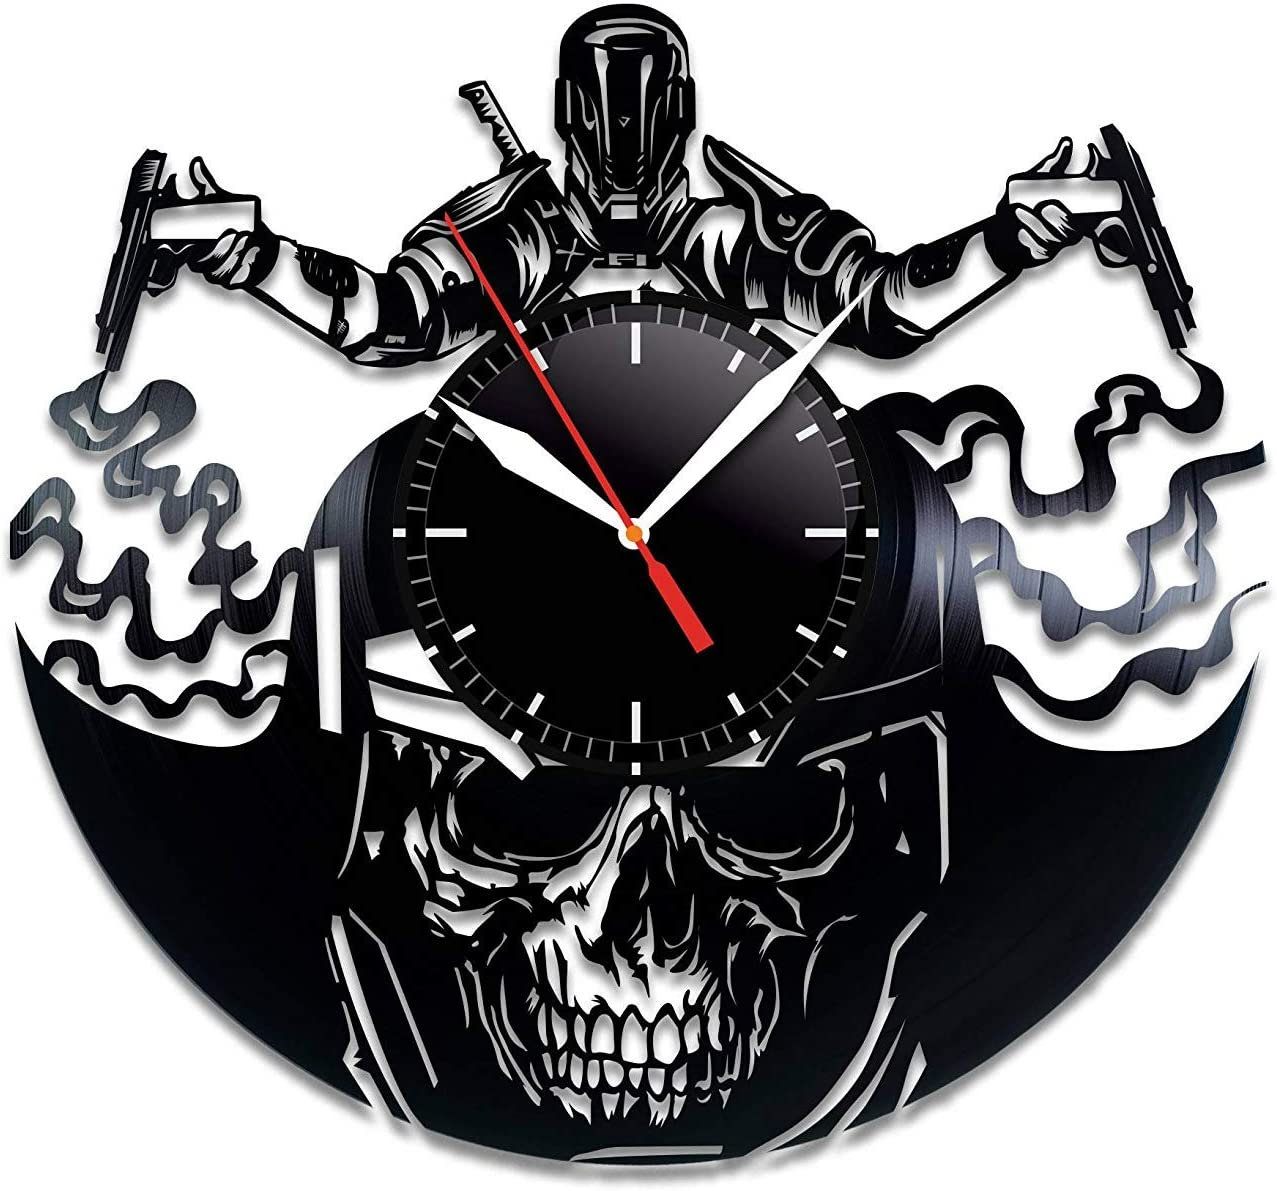 Call of オンラインショッピング Duty Infinite Warfare Vinyl Home 正規逆輸入品 Record ncie Wall Clock